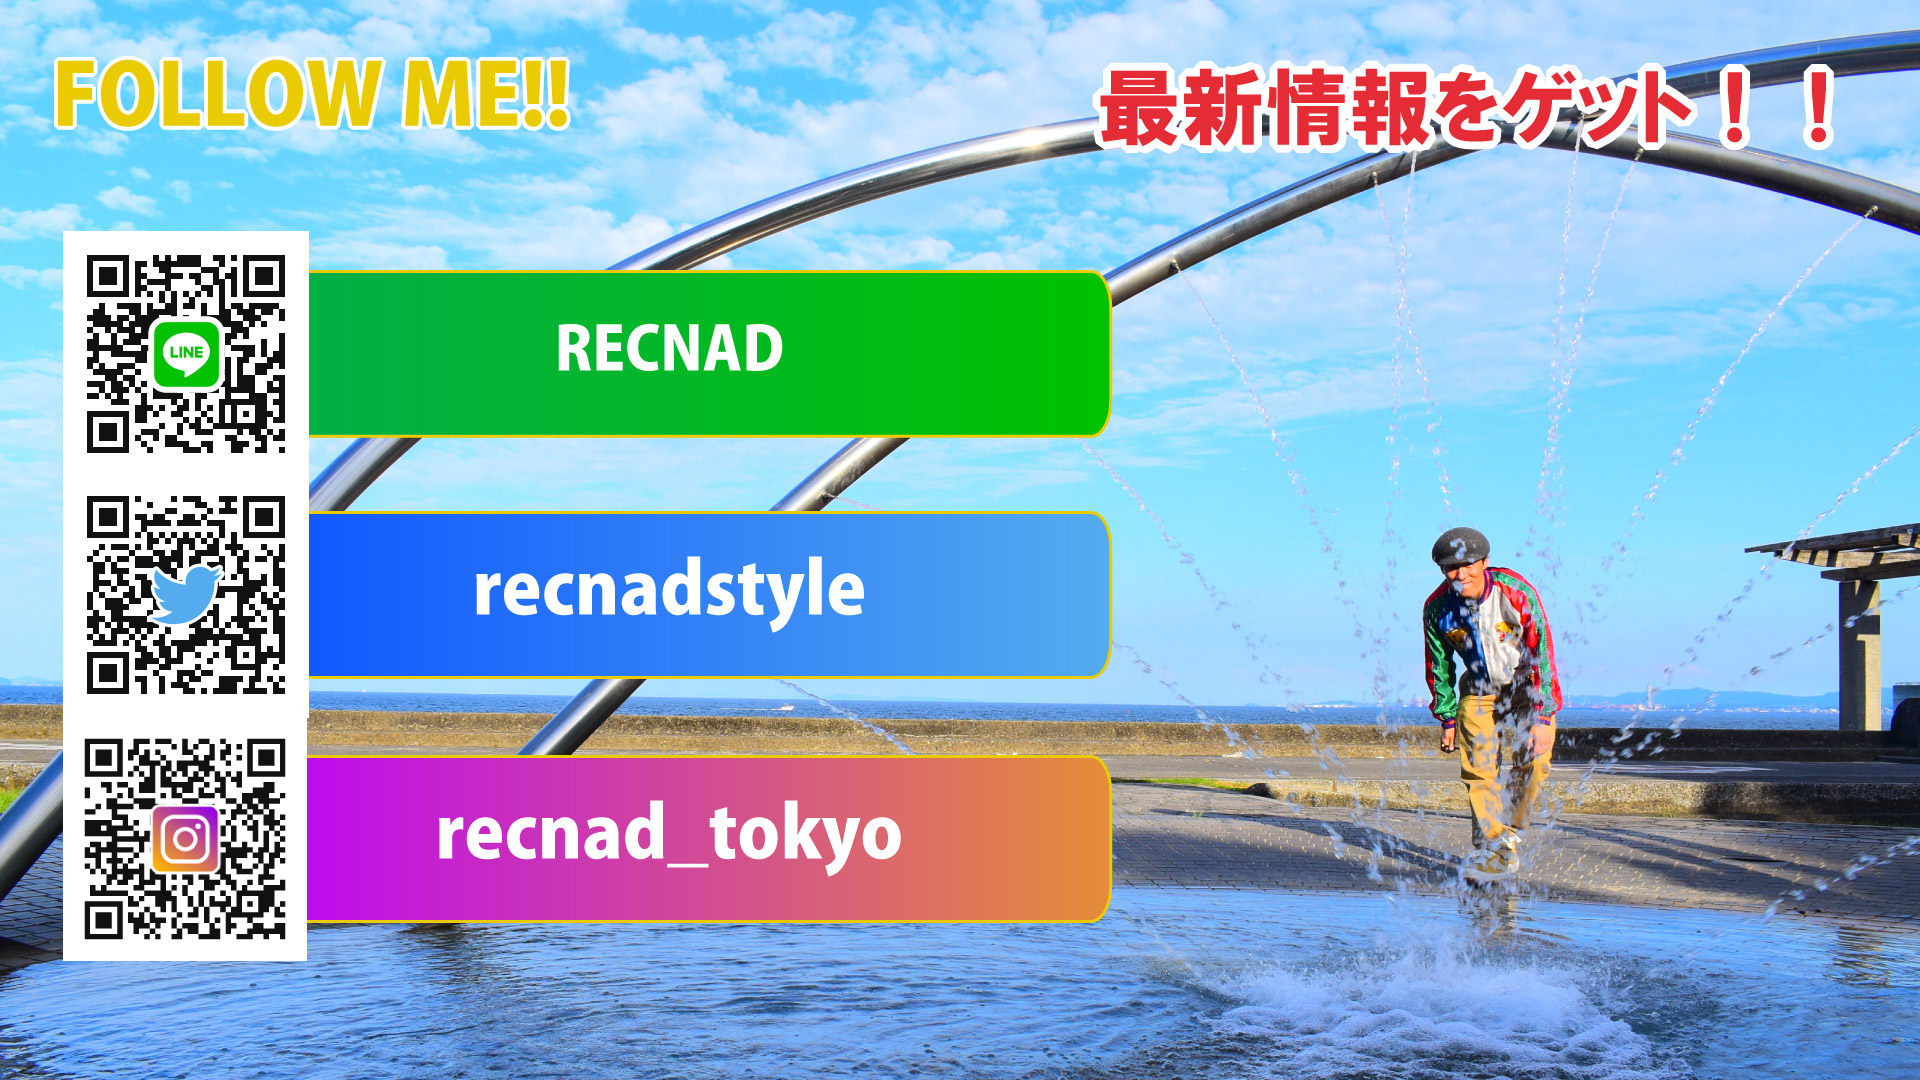 RECNADのSNS登録で最新情報ゲット | 毎週水・日更新450人参加中 RECNAD LINE@